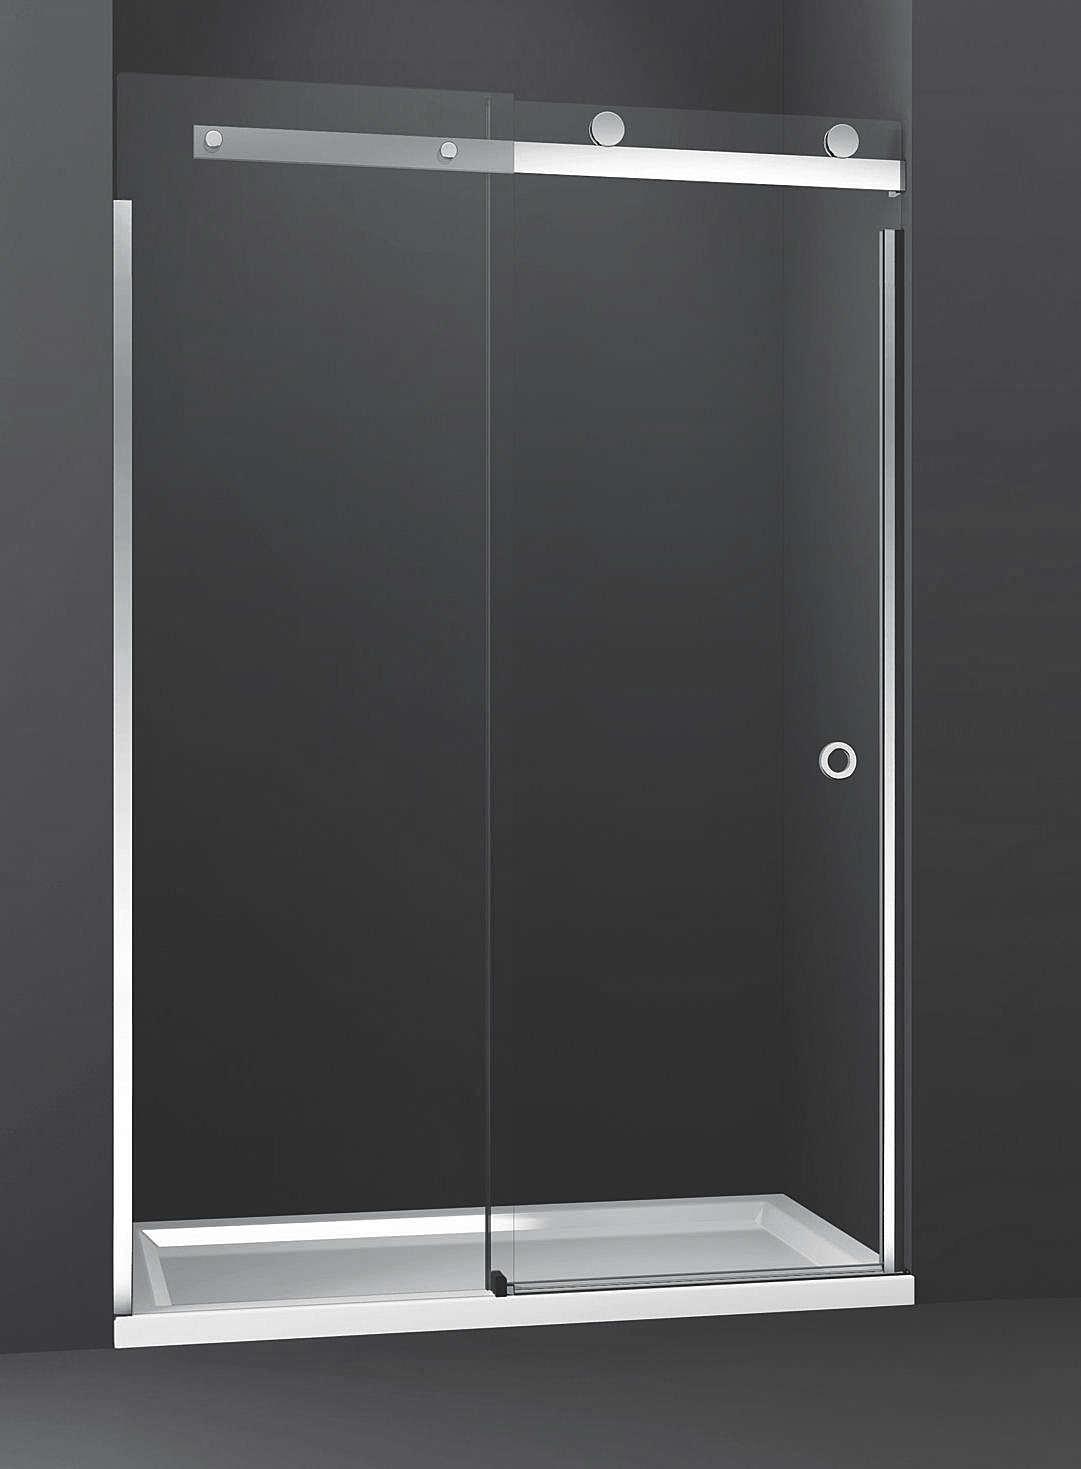 Merlyn 10 Series Sliding Shower Door 1200mm